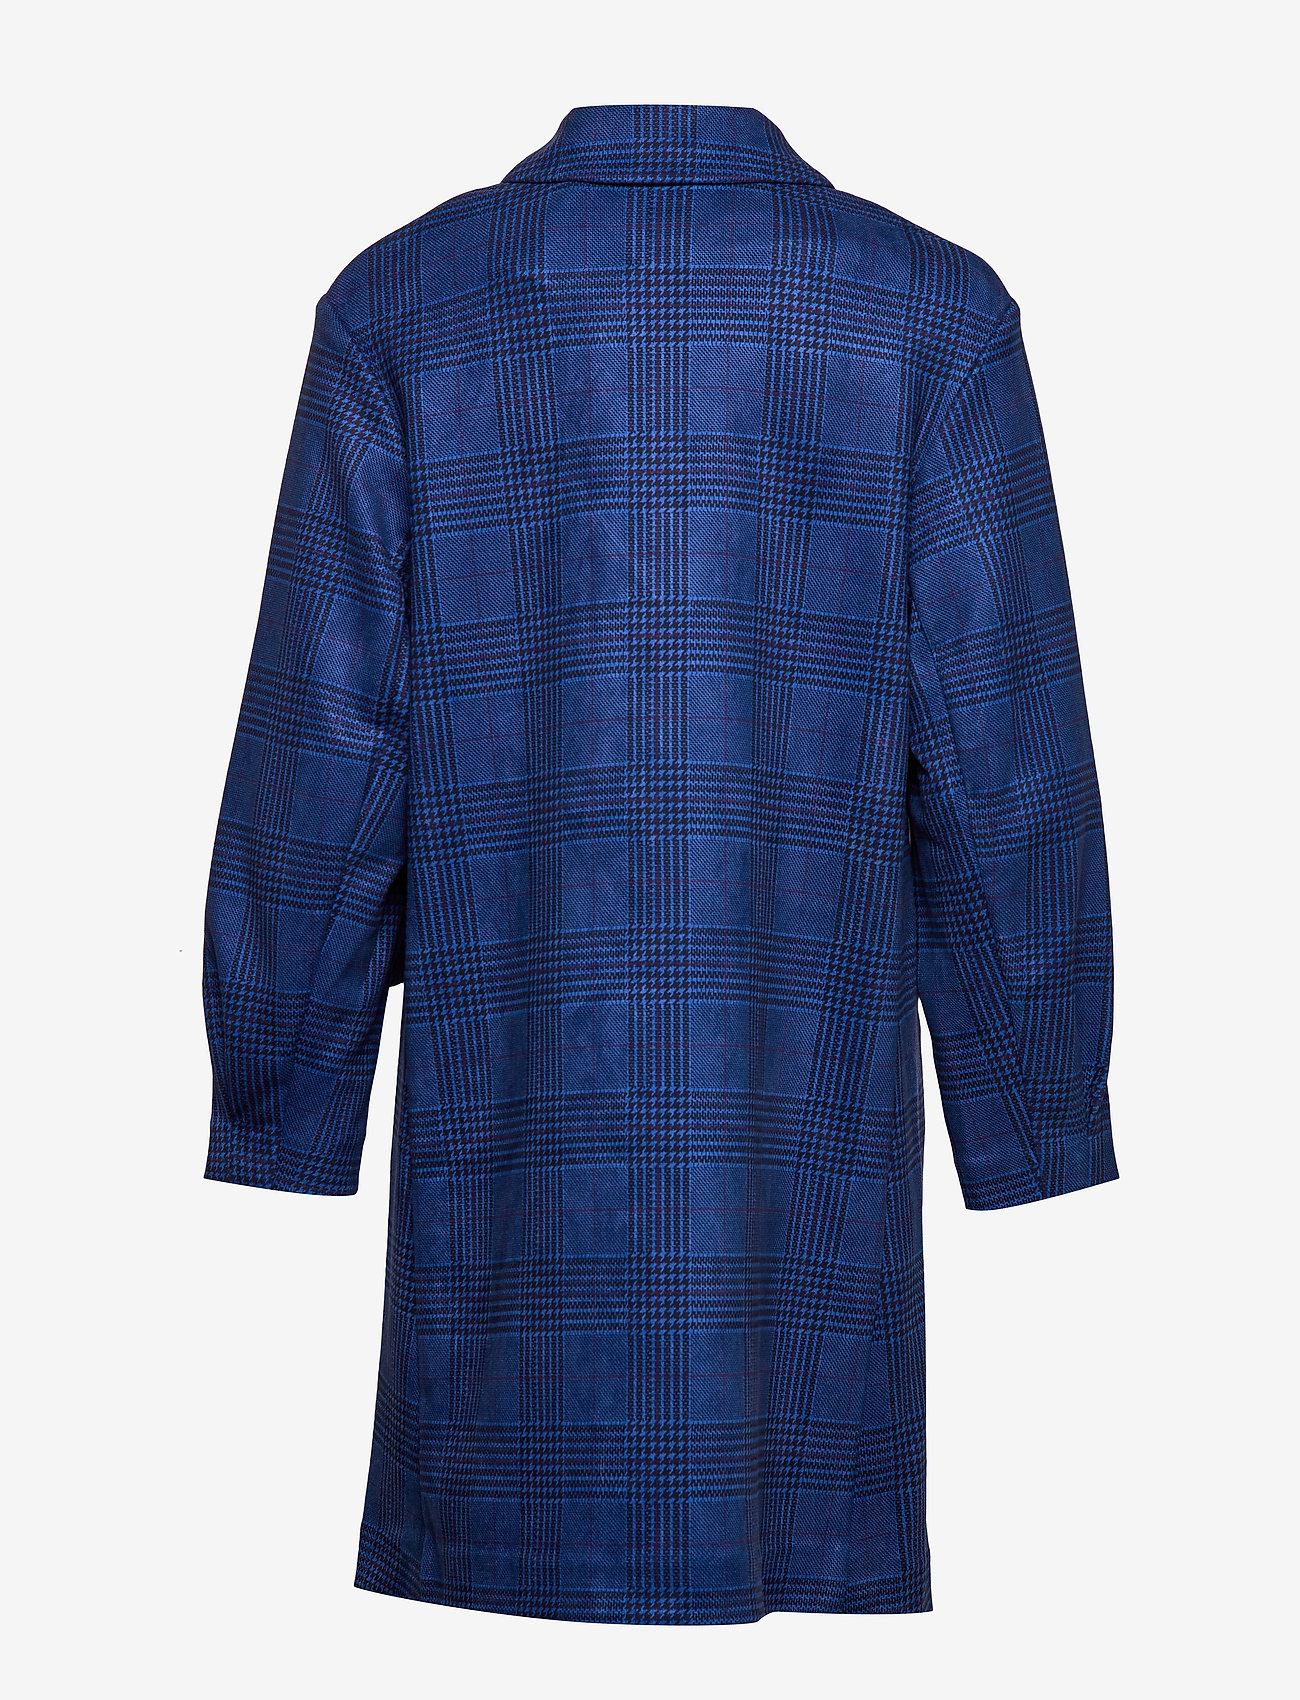 Long Jacket In Faux Suede Check (Check W. Sky Blue) (569.70 kr) - Coster Copenhagen